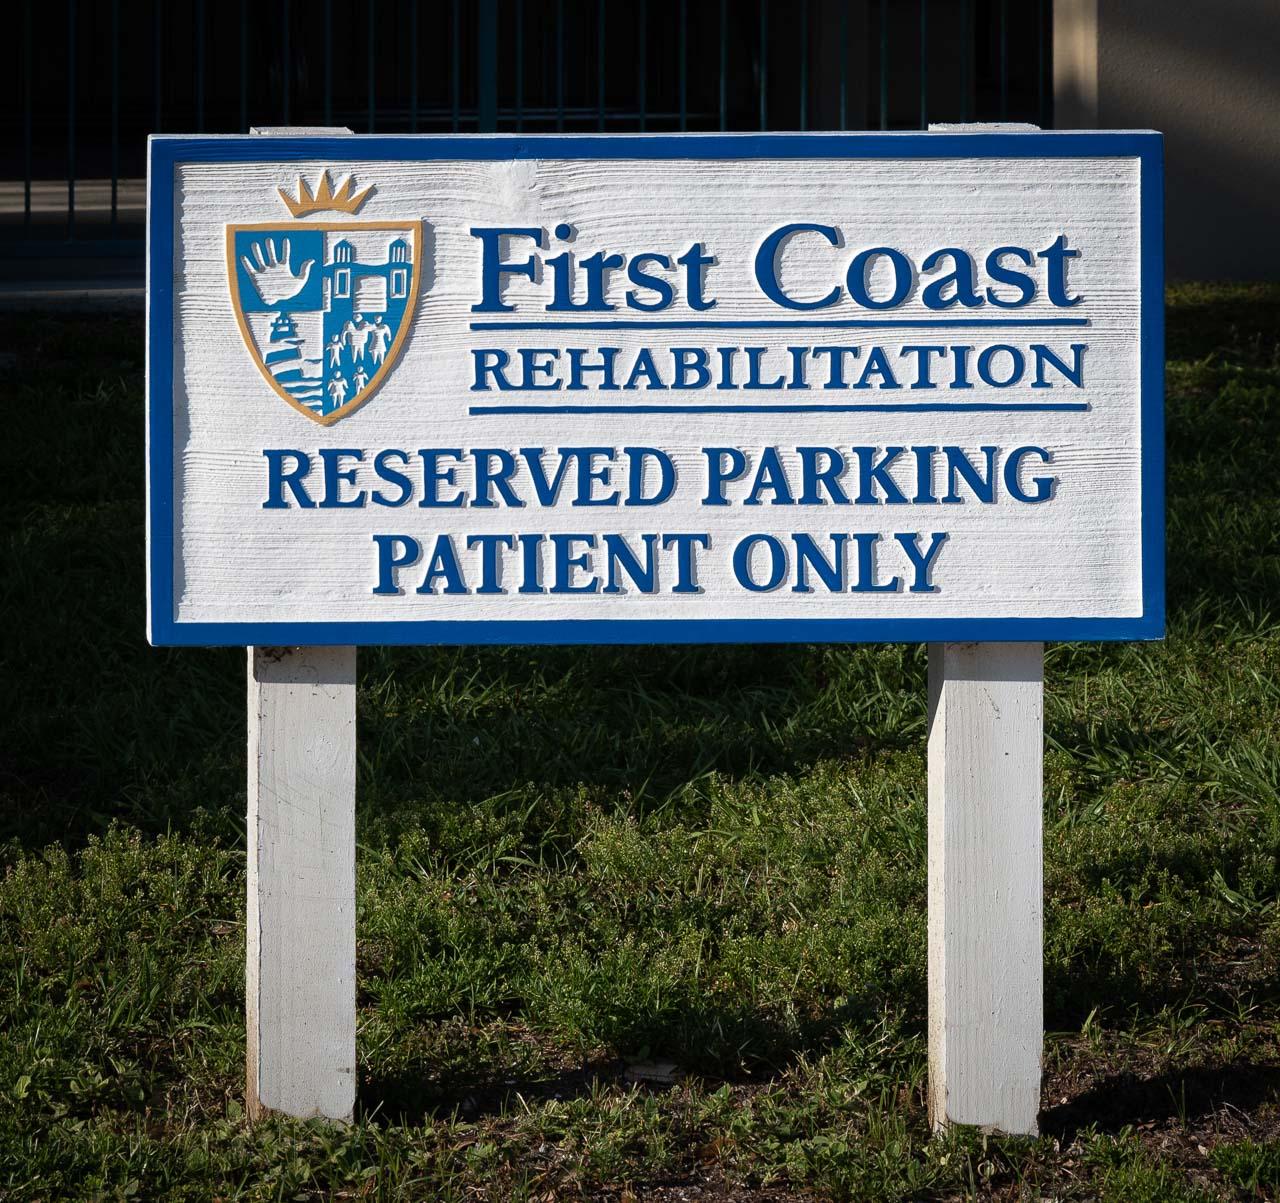 First Coast Rehabilitation